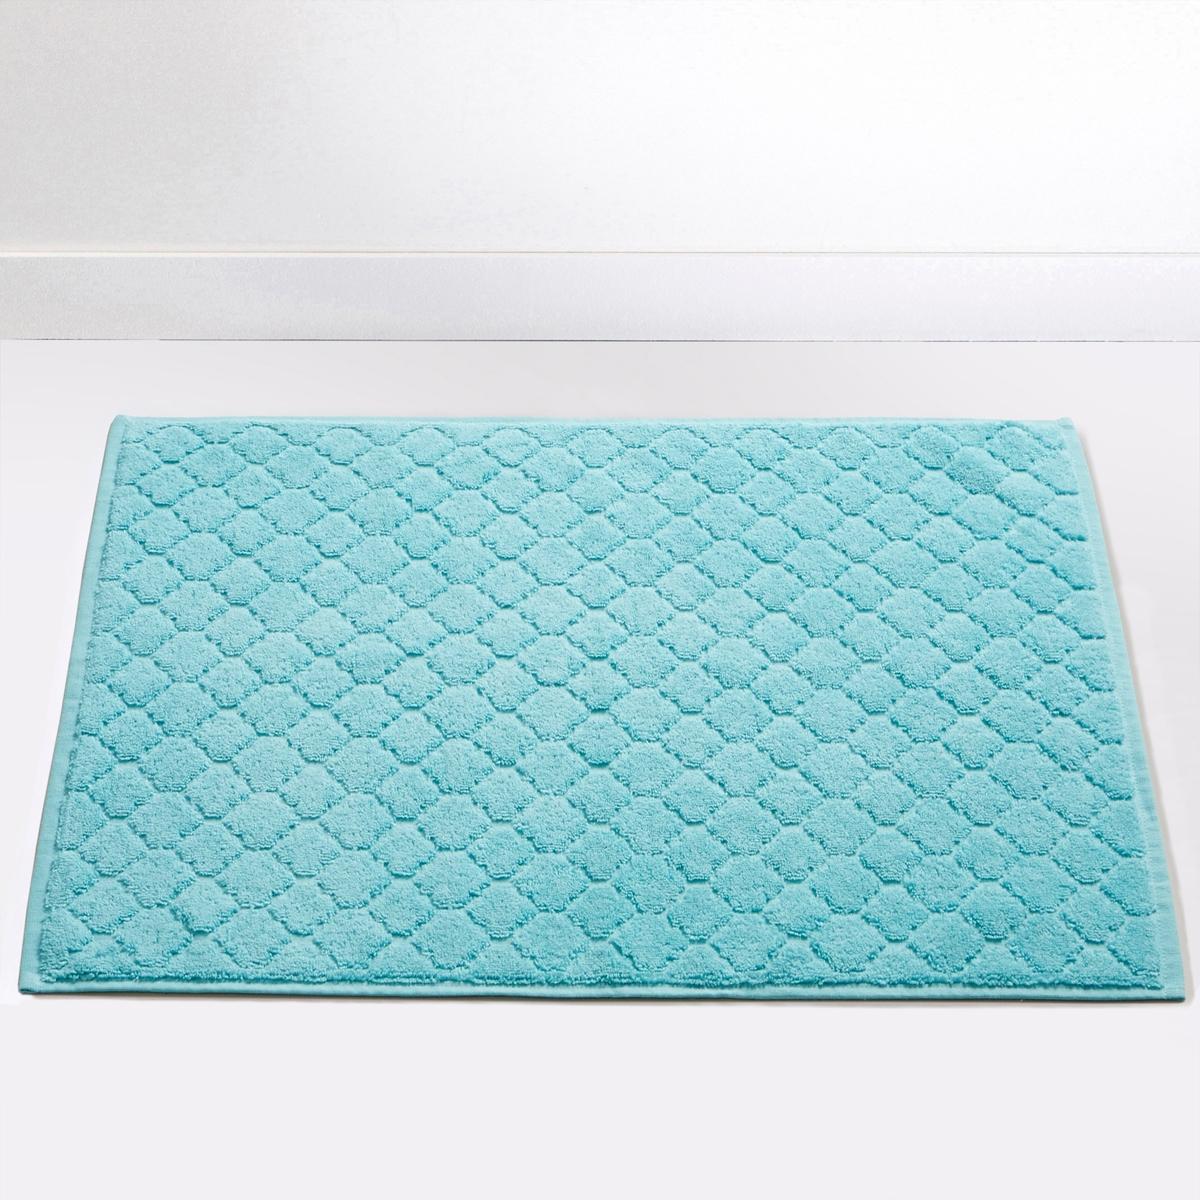 Badezimmerteppich Aljustrel| 700 g/m² | Bad | Baumwolle | La Redoute Interieurs